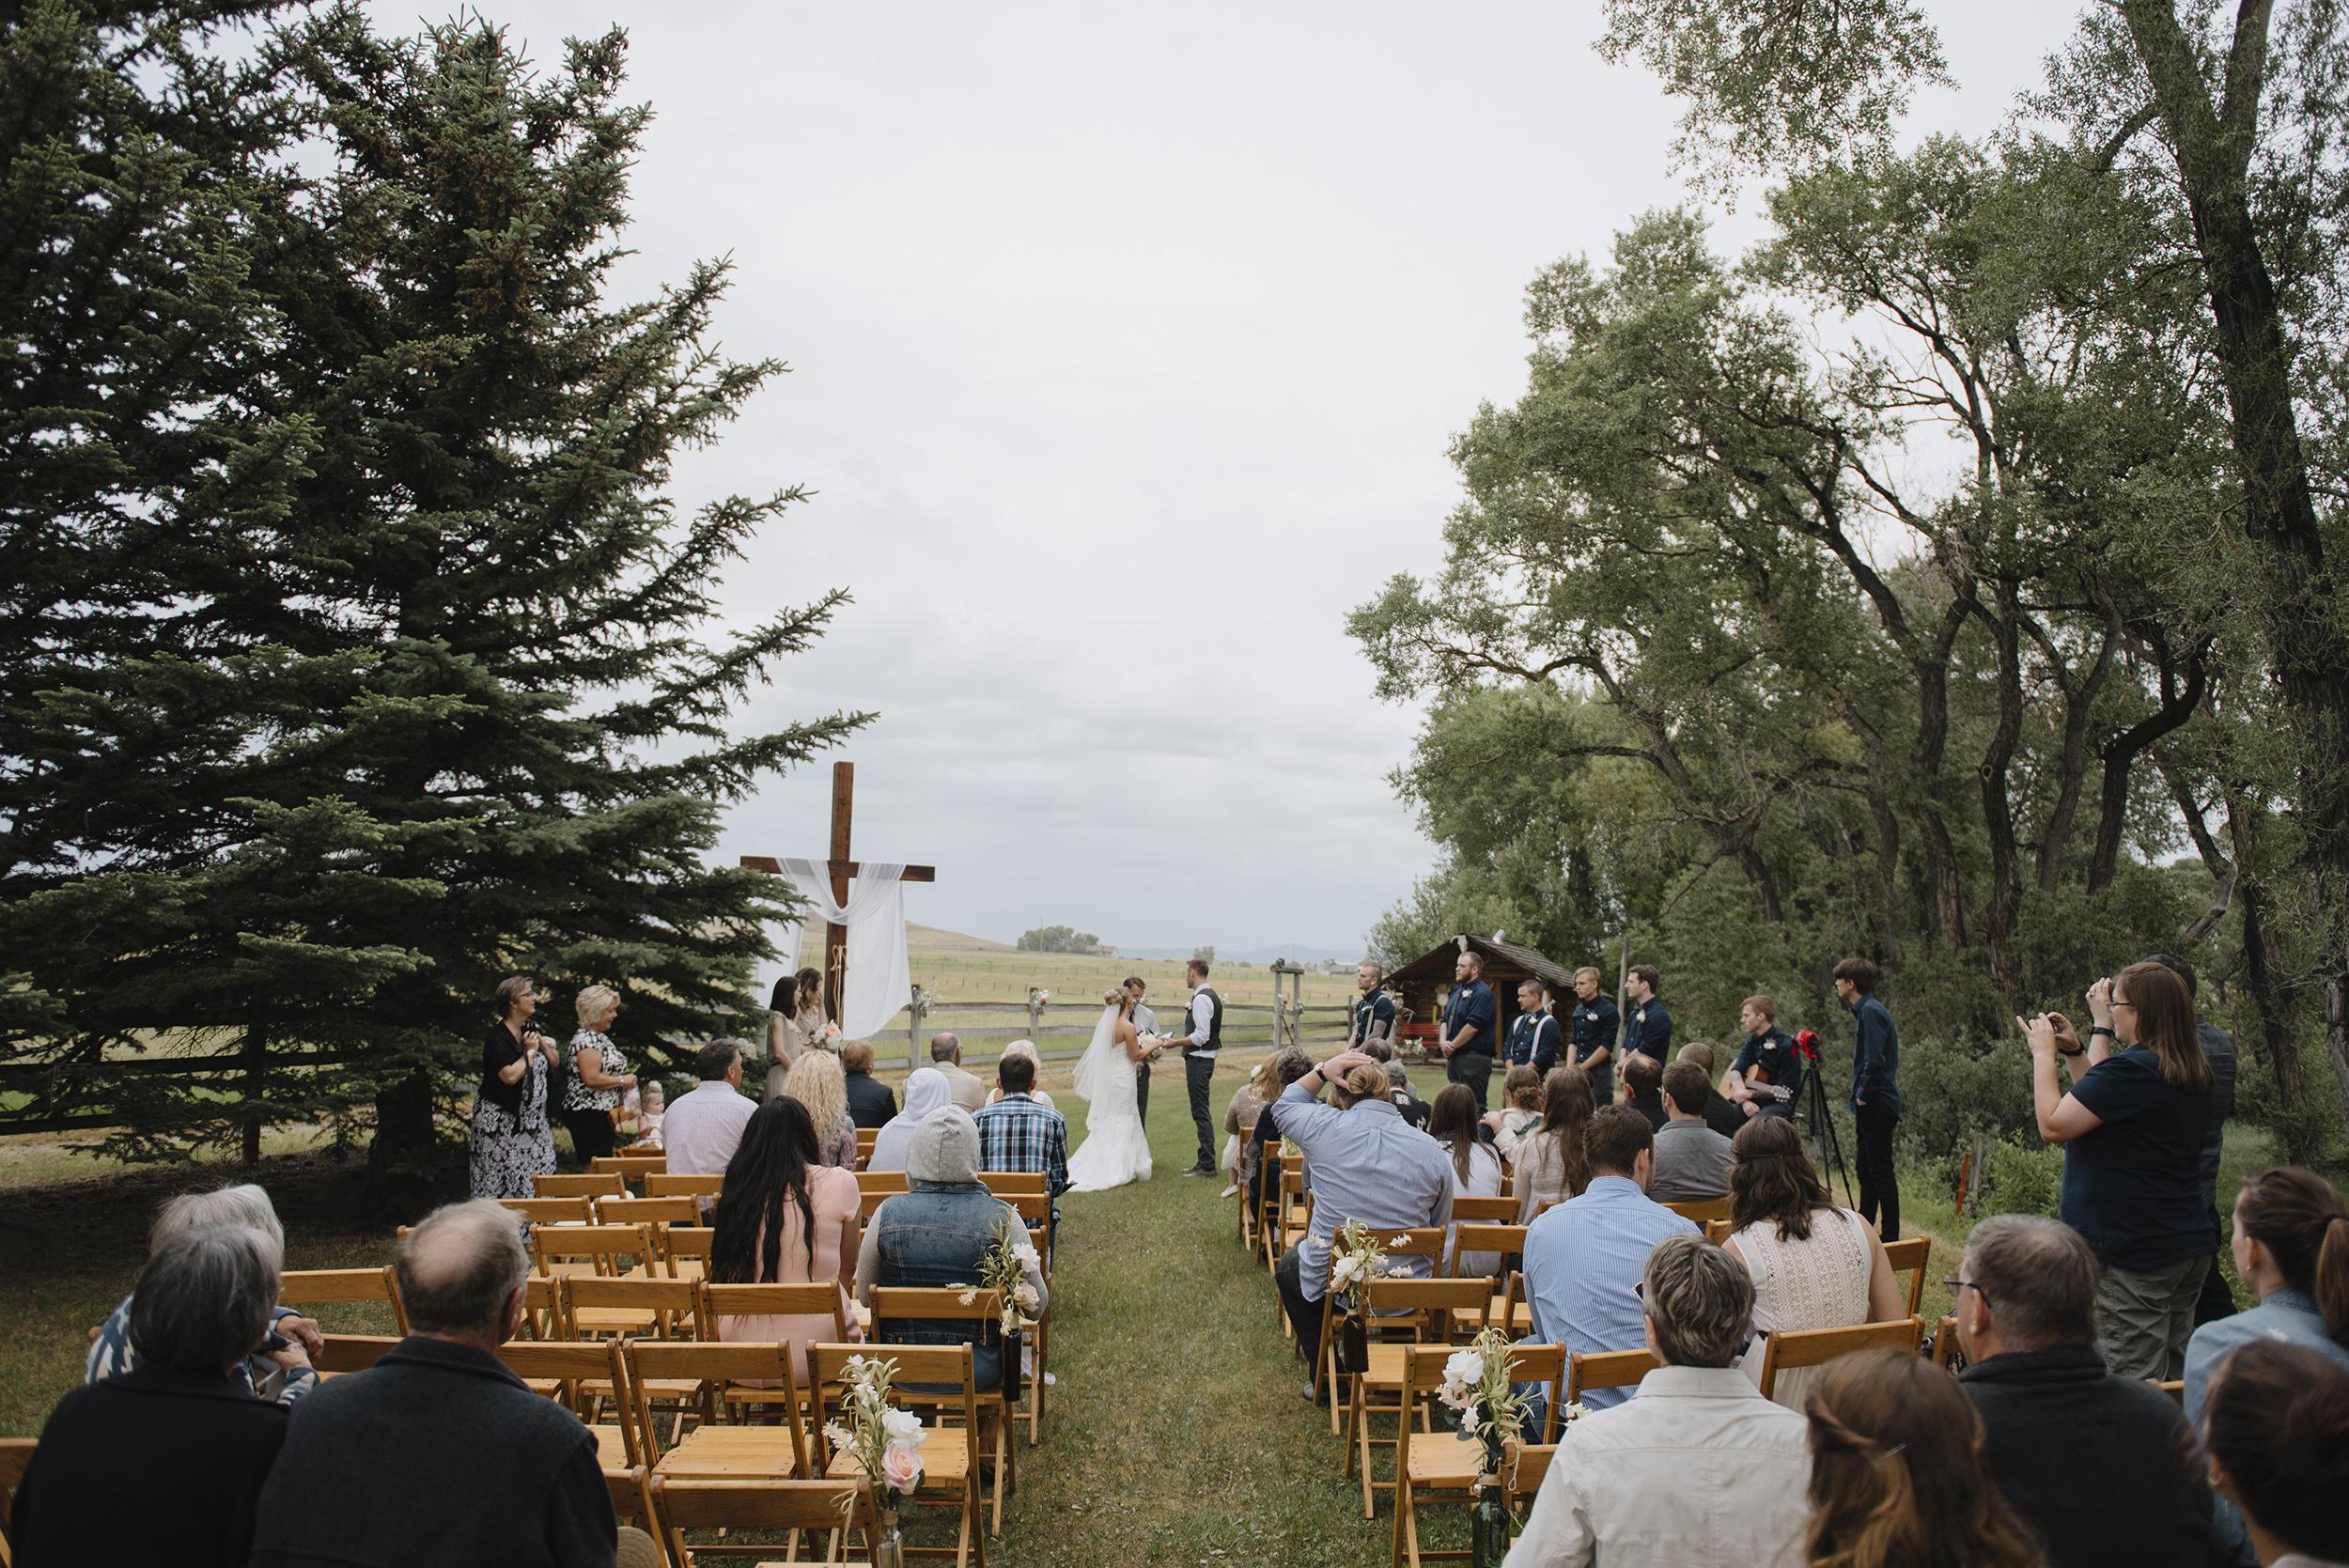 Colby-and-Jess-Intimate-Backyard-Wedding-Bozeman-Montana380.jpg